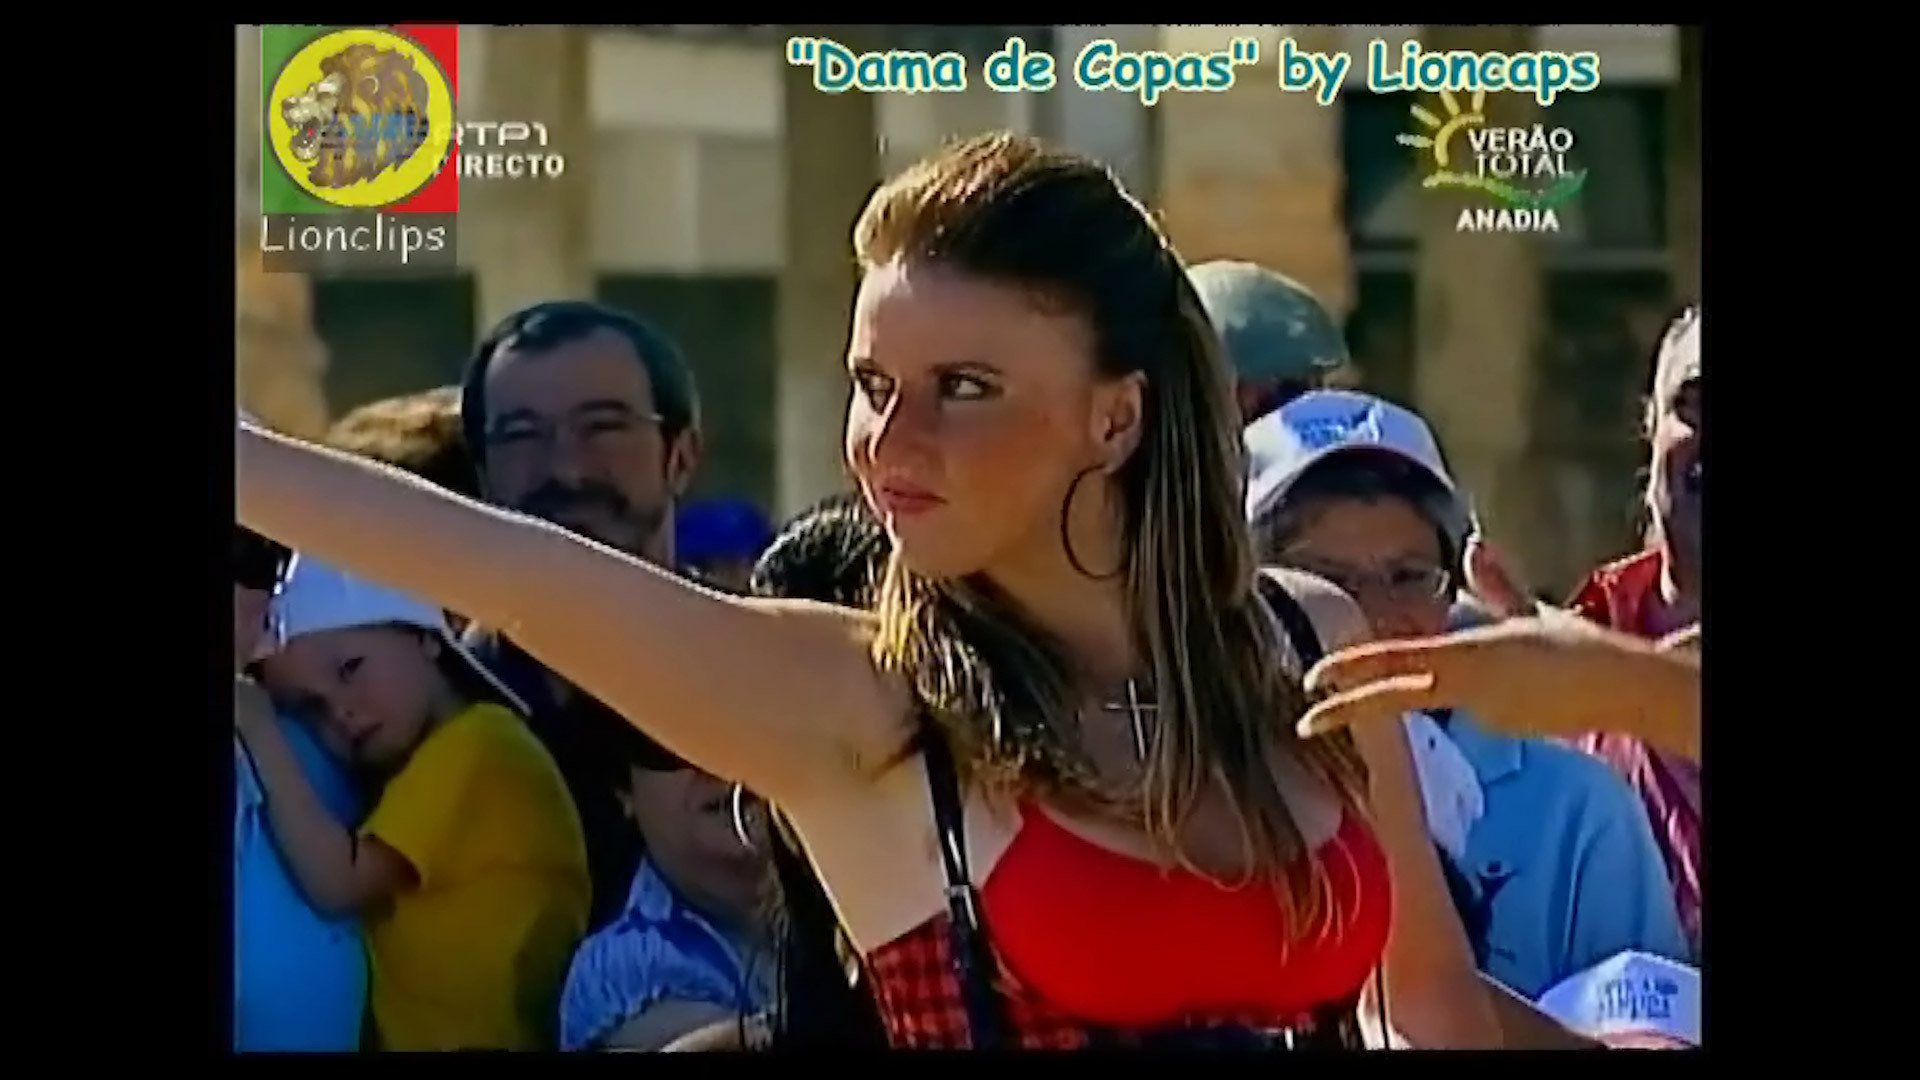 bestoff_portugal_d1_lioncaps_03_06_2021 (13).jpg